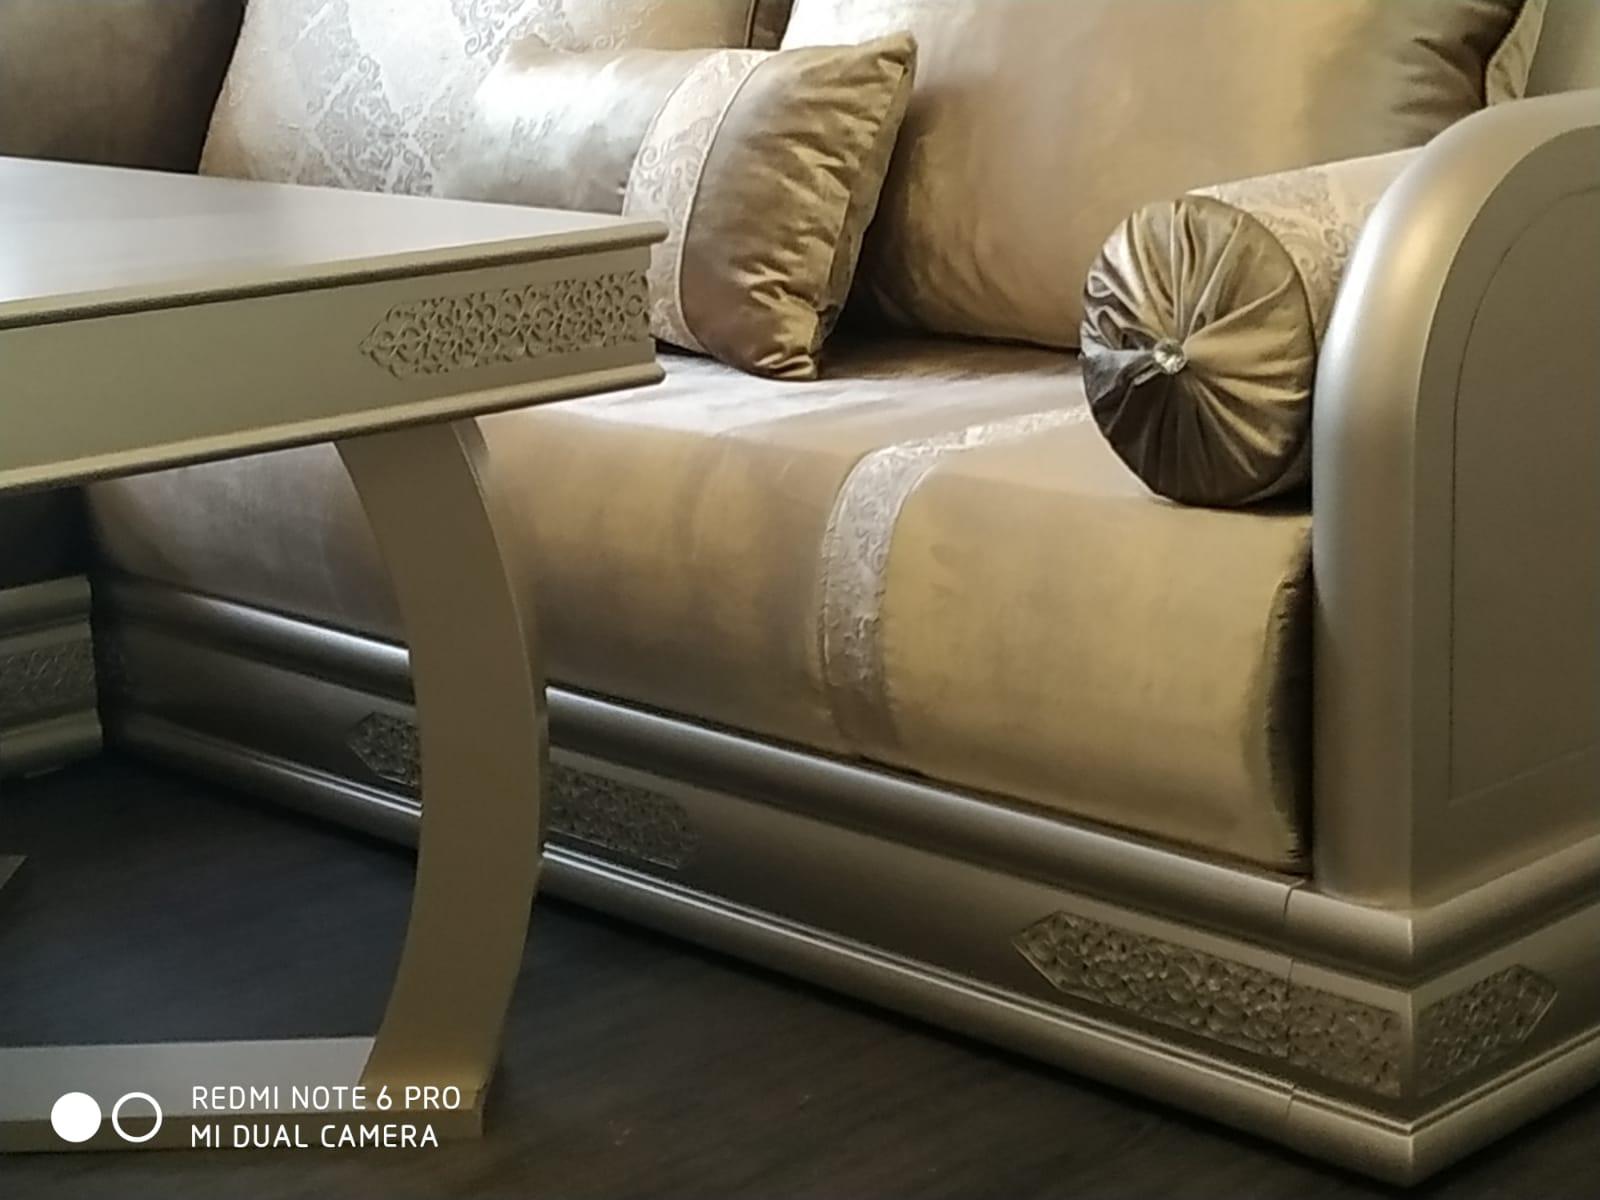 Comment Fabriquer Un Sedari Marocain salon marocain moderne sur mesure - objets d'artisanat marocain